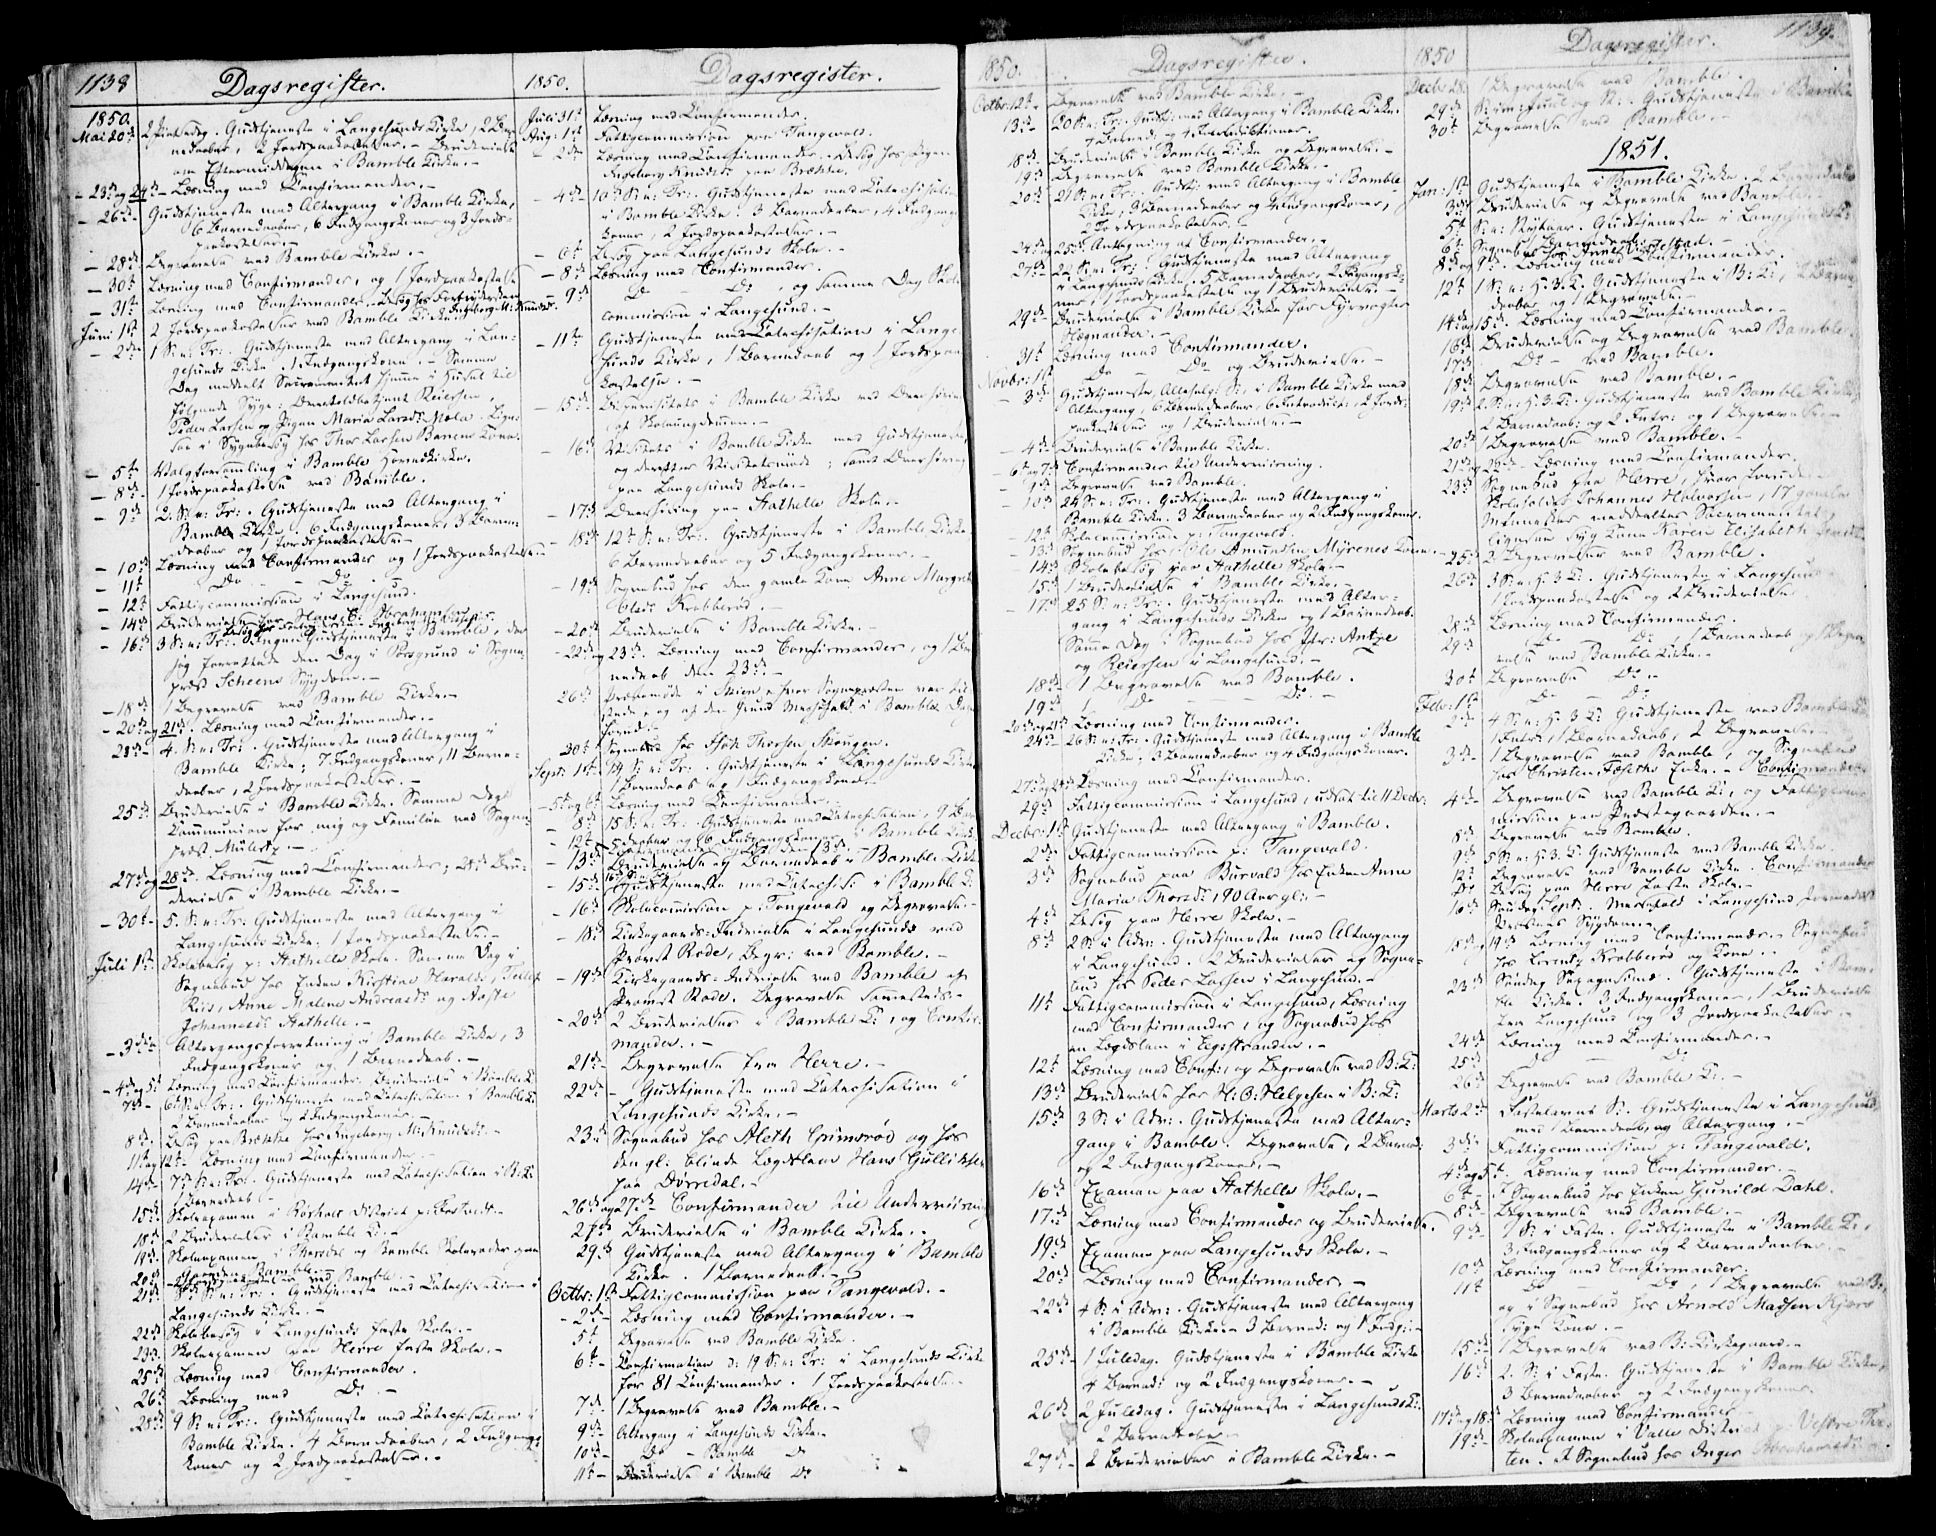 SAKO, Bamble kirkebøker, F/Fa/L0004: Ministerialbok nr. I 4, 1834-1853, s. 1138-1139